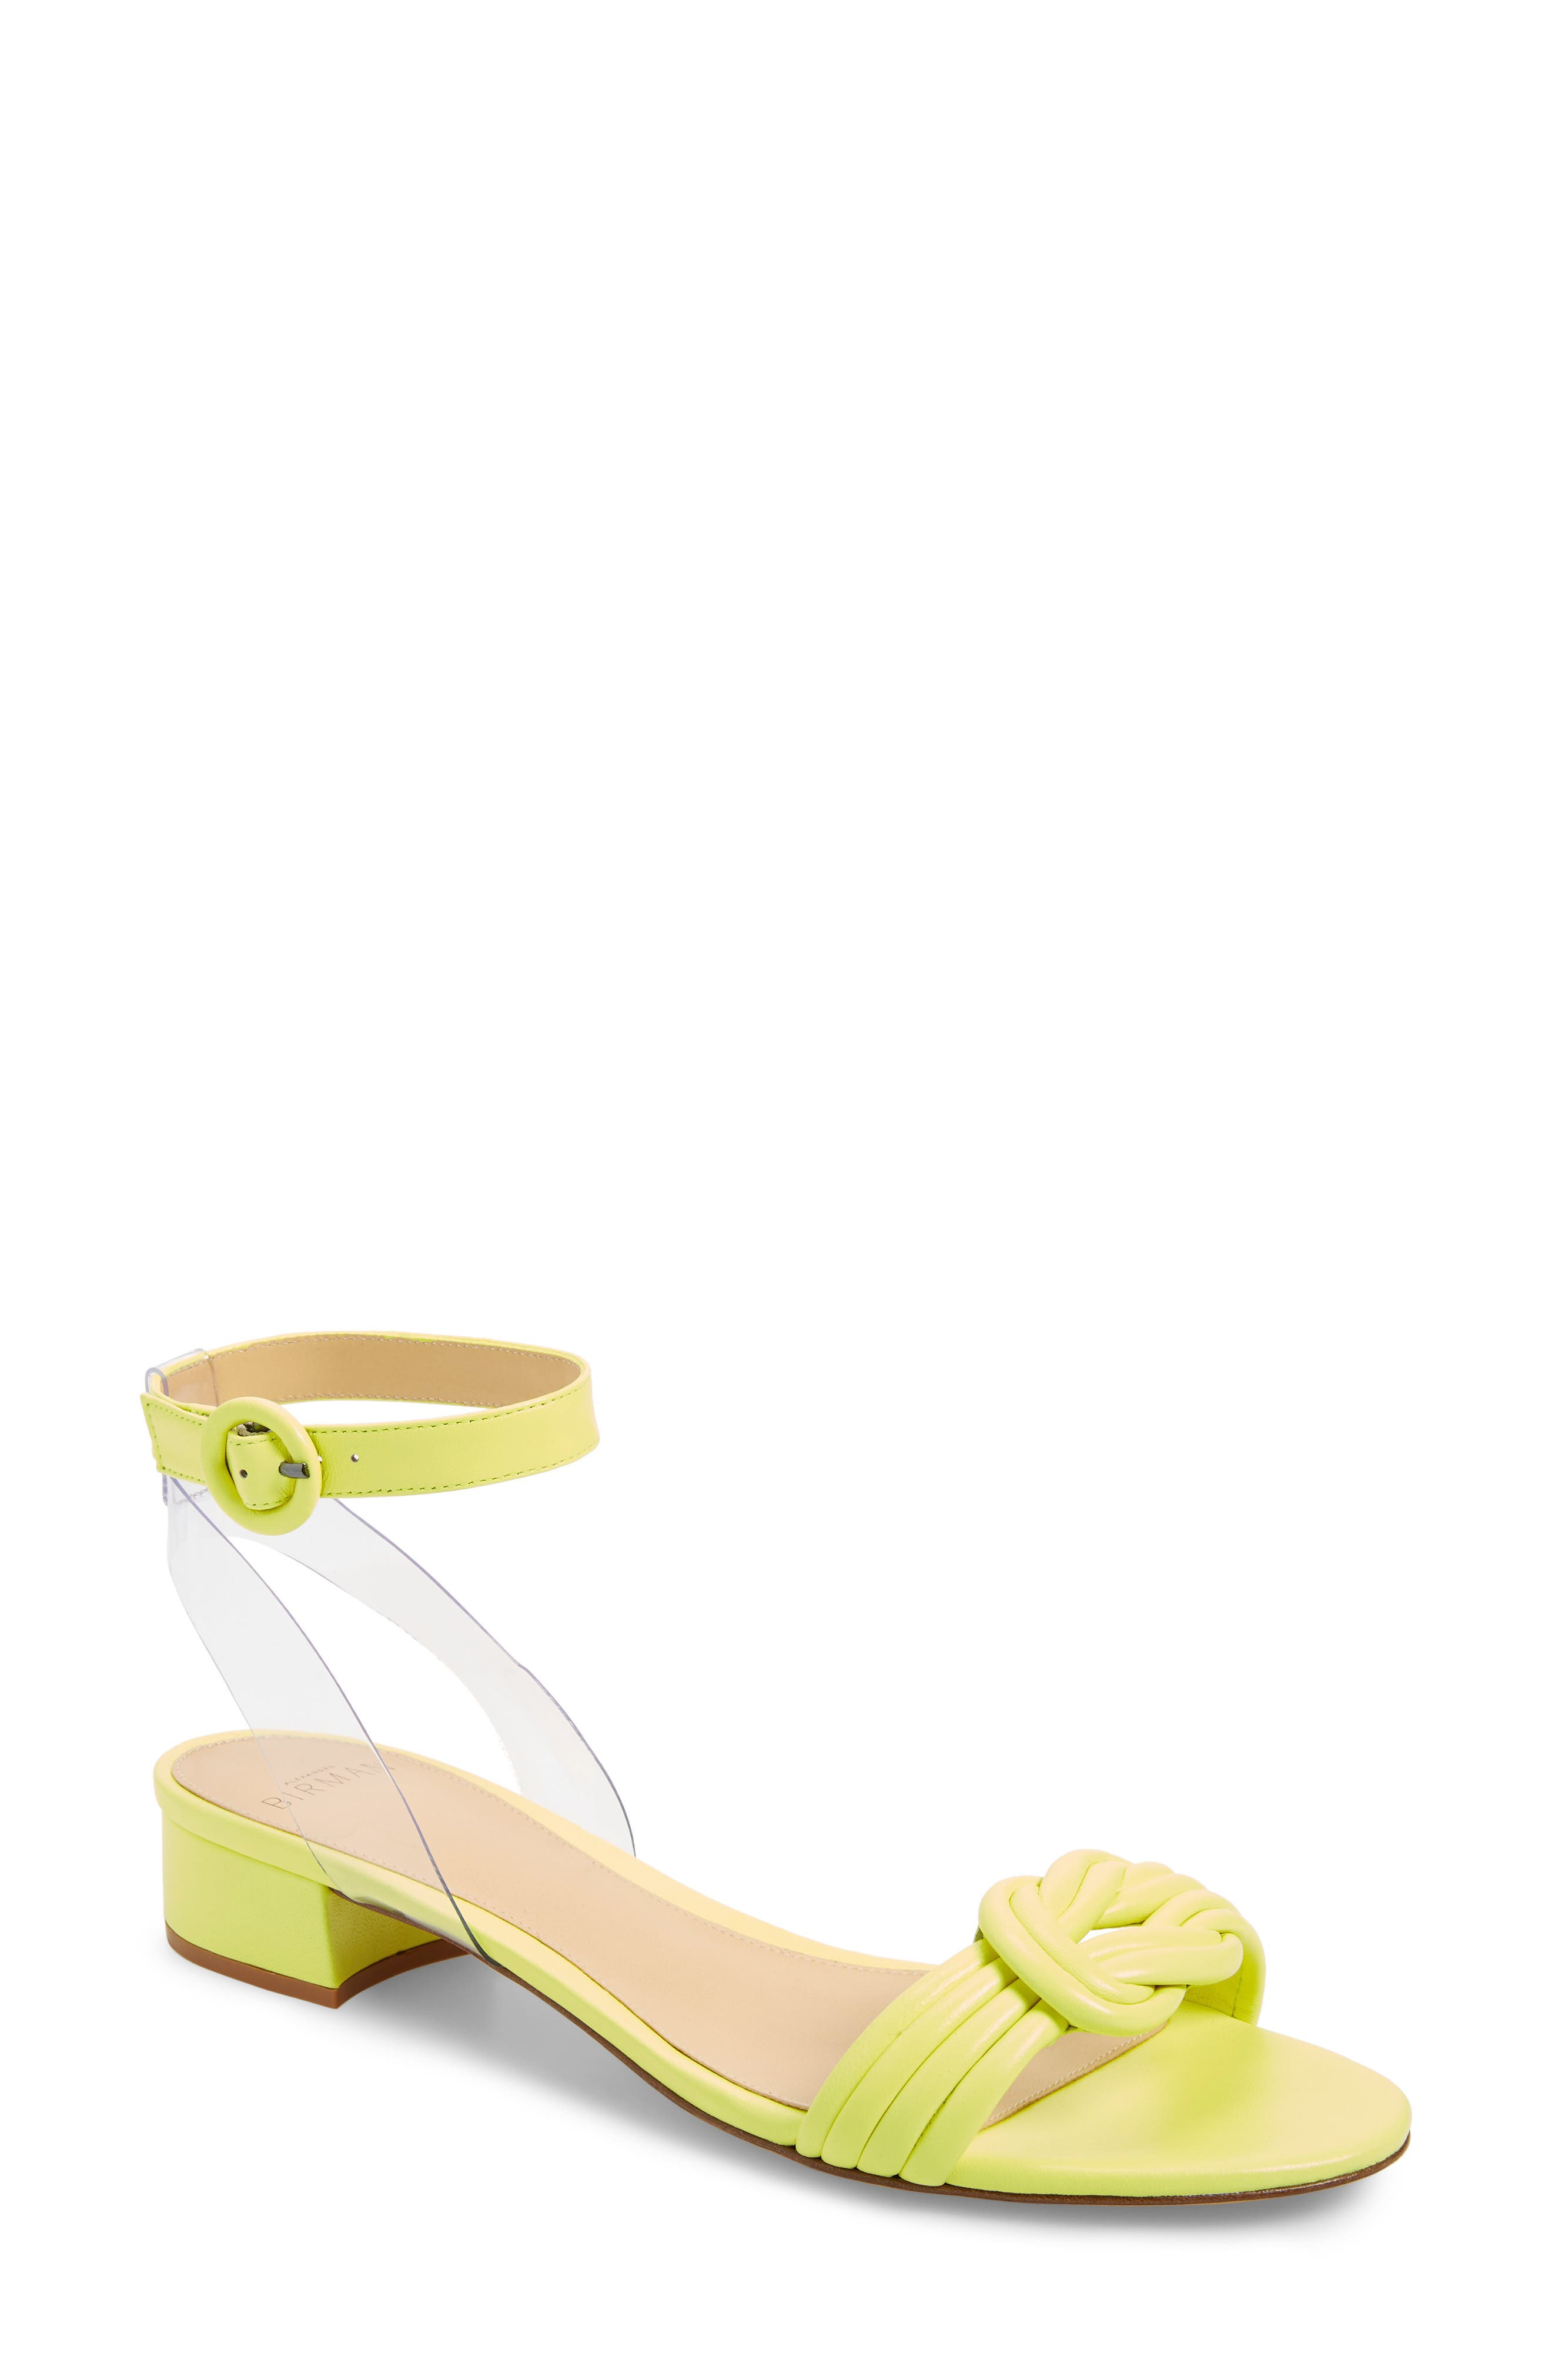 Alexandre Birman Vicky Ankle Strap Sandal, Yellow